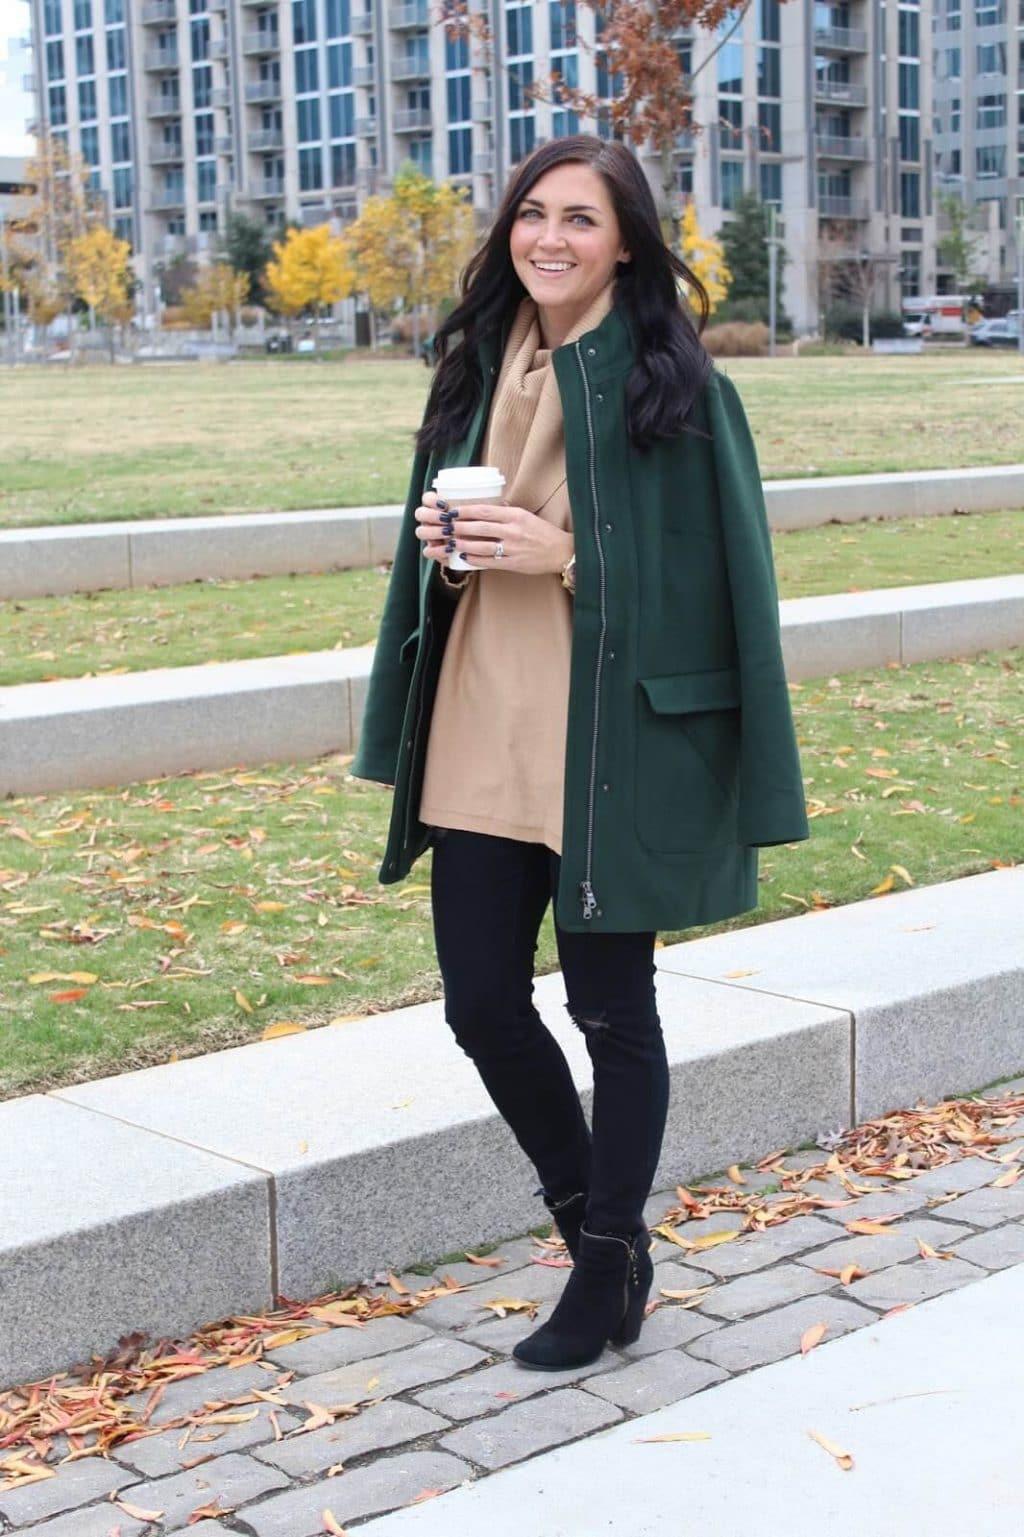 J Jill Hunter green coat | Cowl Neck Nordstrom Sweater | Distressed Black Denim | Charlotte, NC